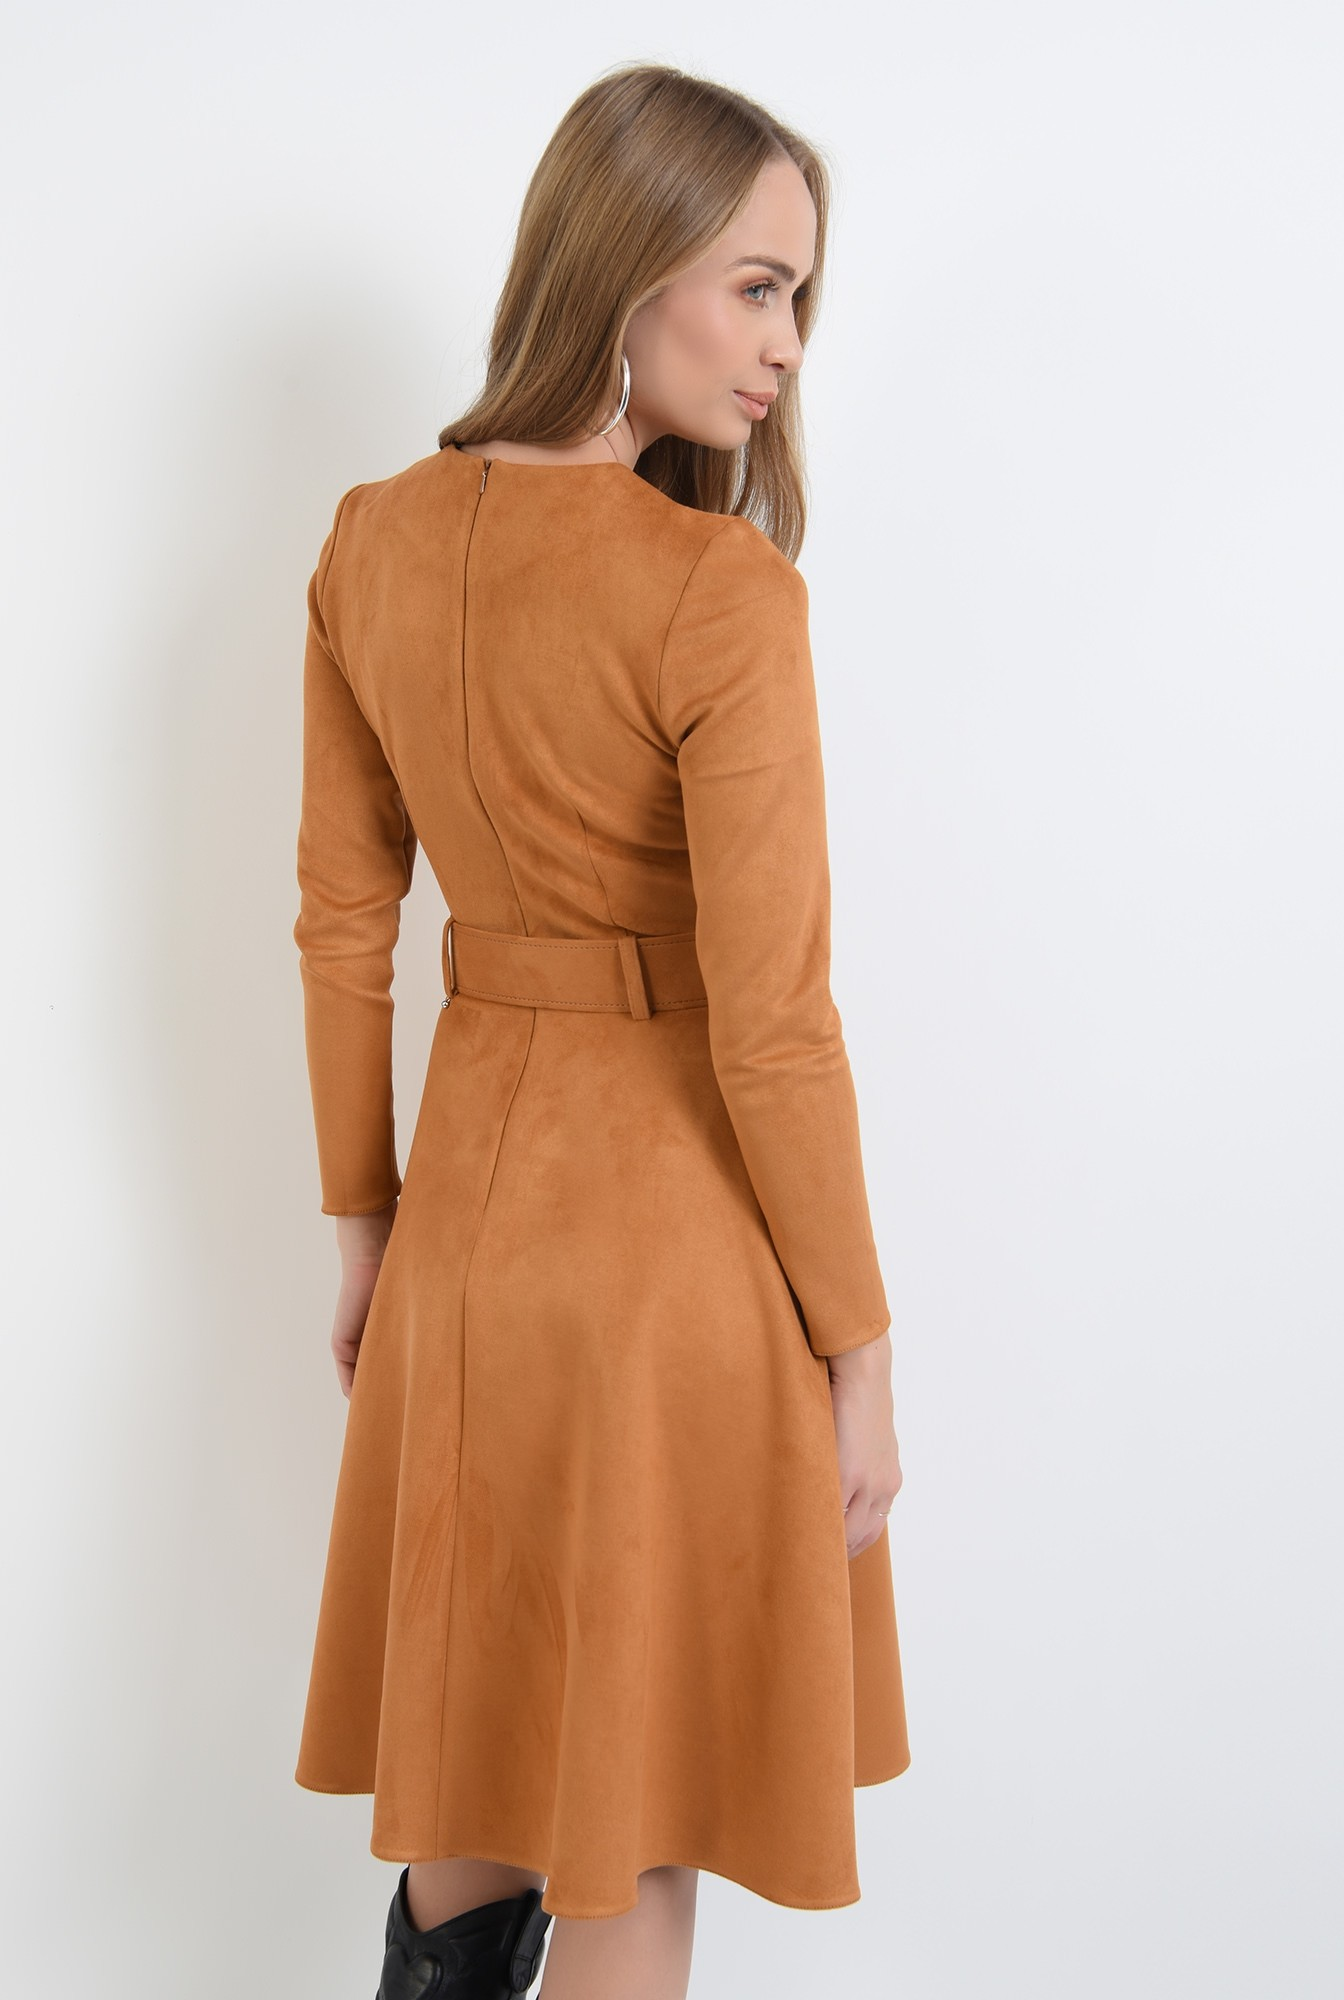 1 - 360 - rochie evazata, maro, cu centura